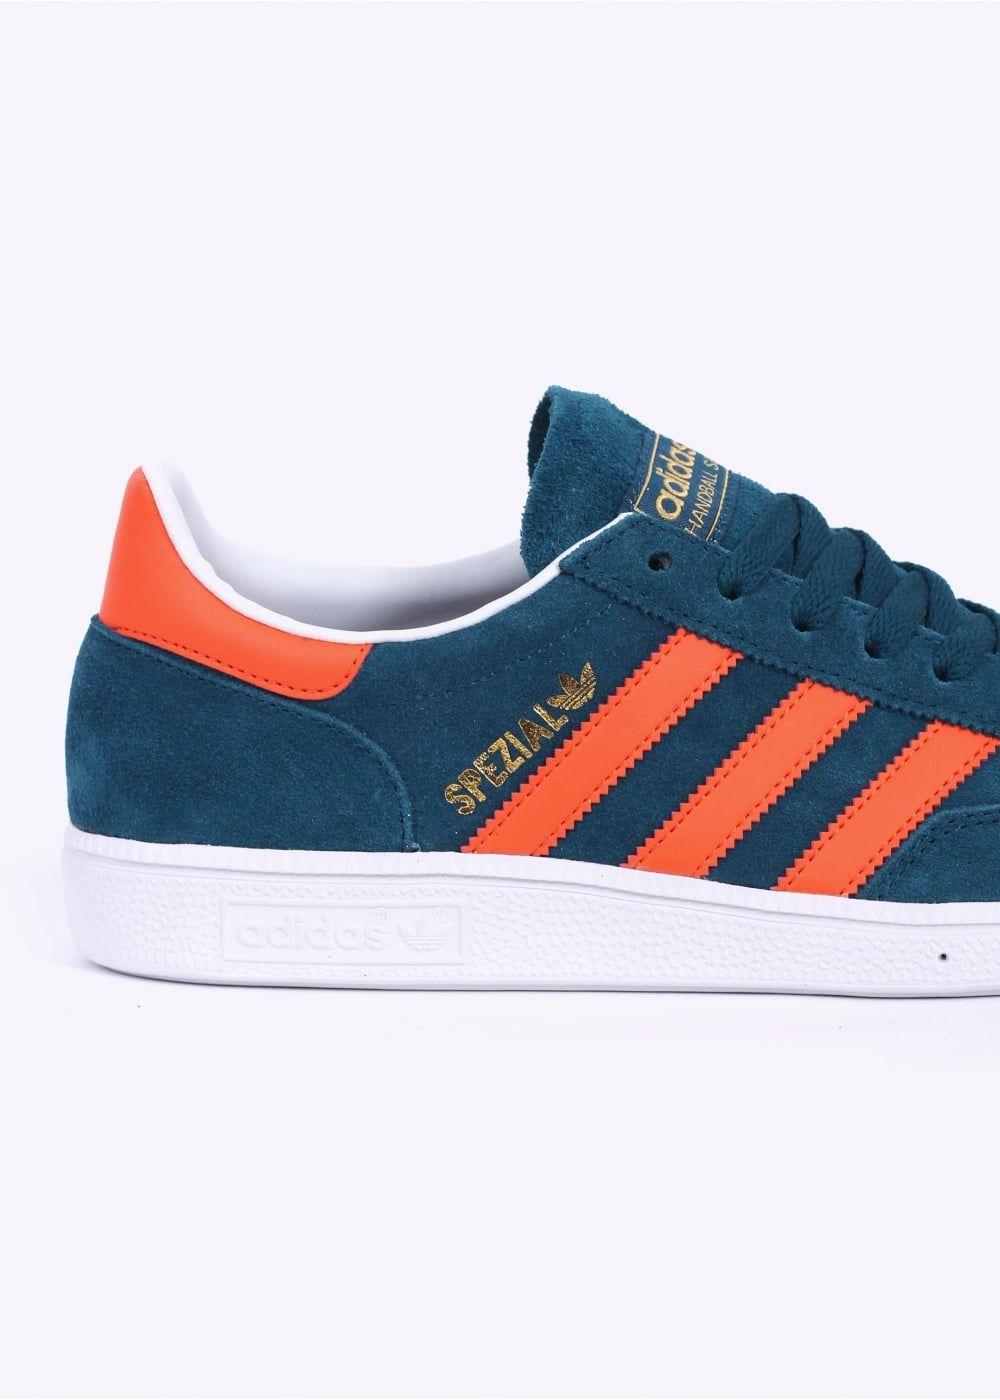 a765accdff38 Adidas Originals Footwear Spezial Trainers - Mineral Grey